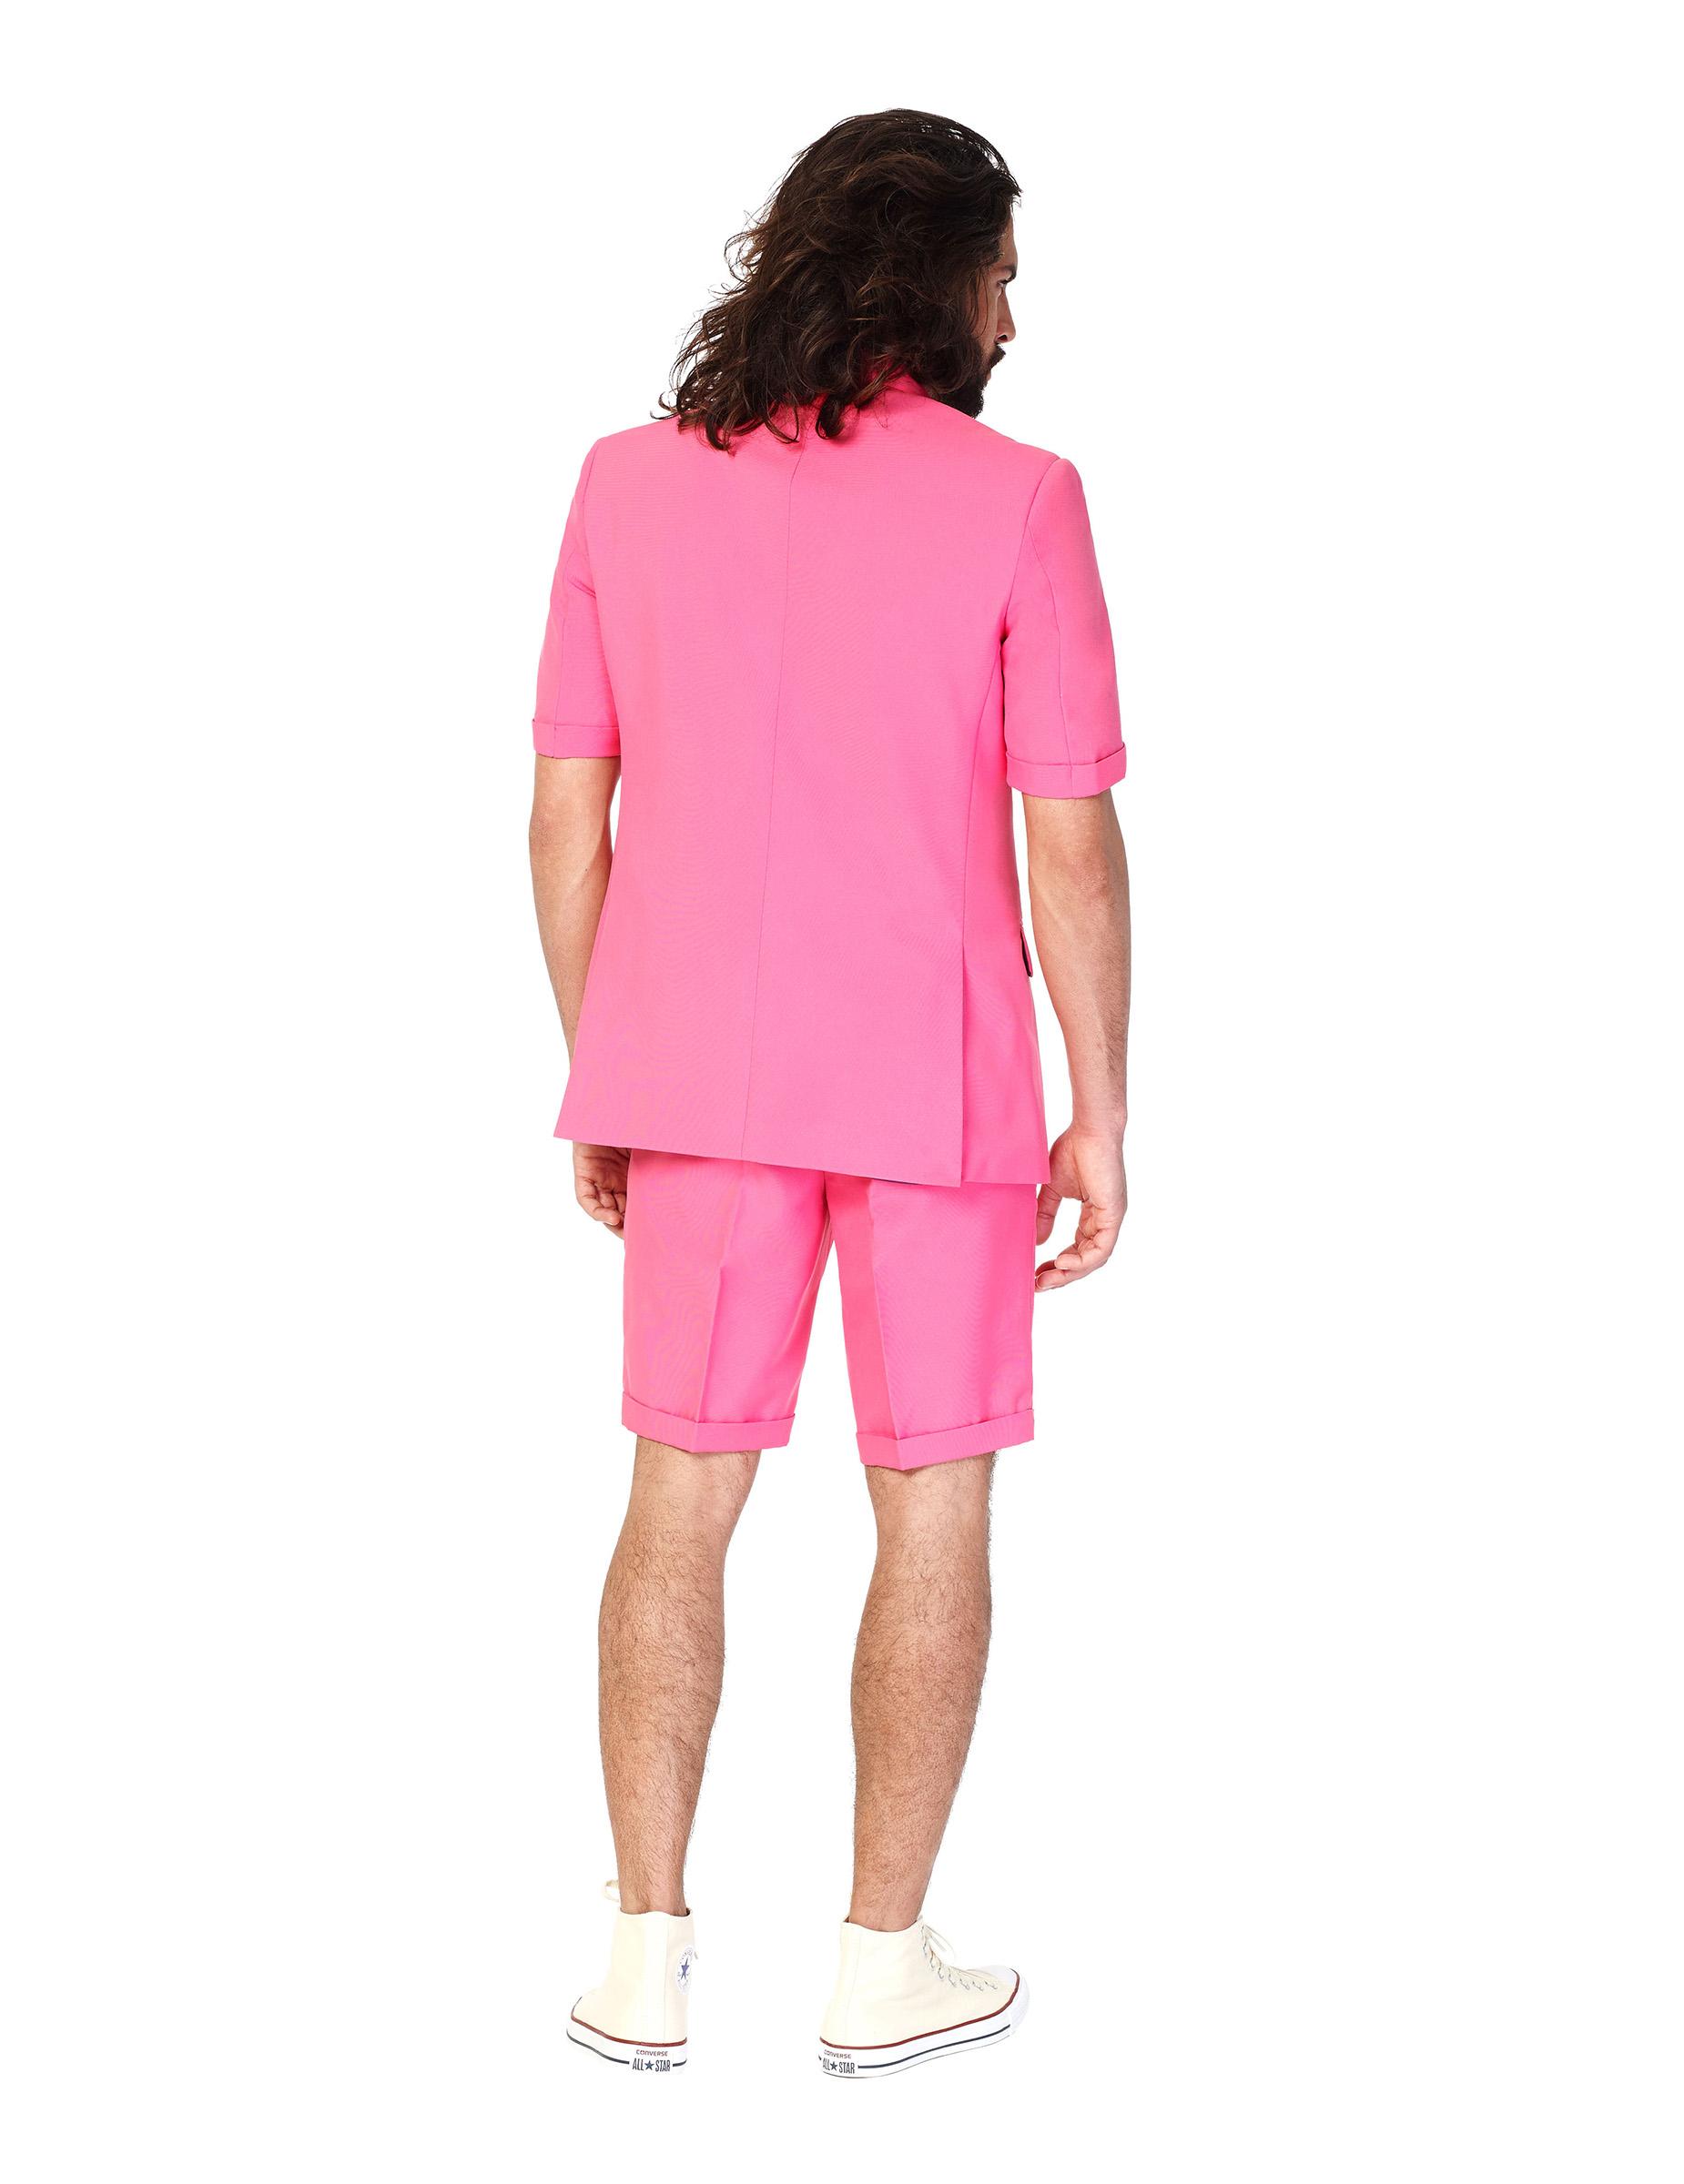 costume d 39 t mr pink homme opposuits achat de. Black Bedroom Furniture Sets. Home Design Ideas